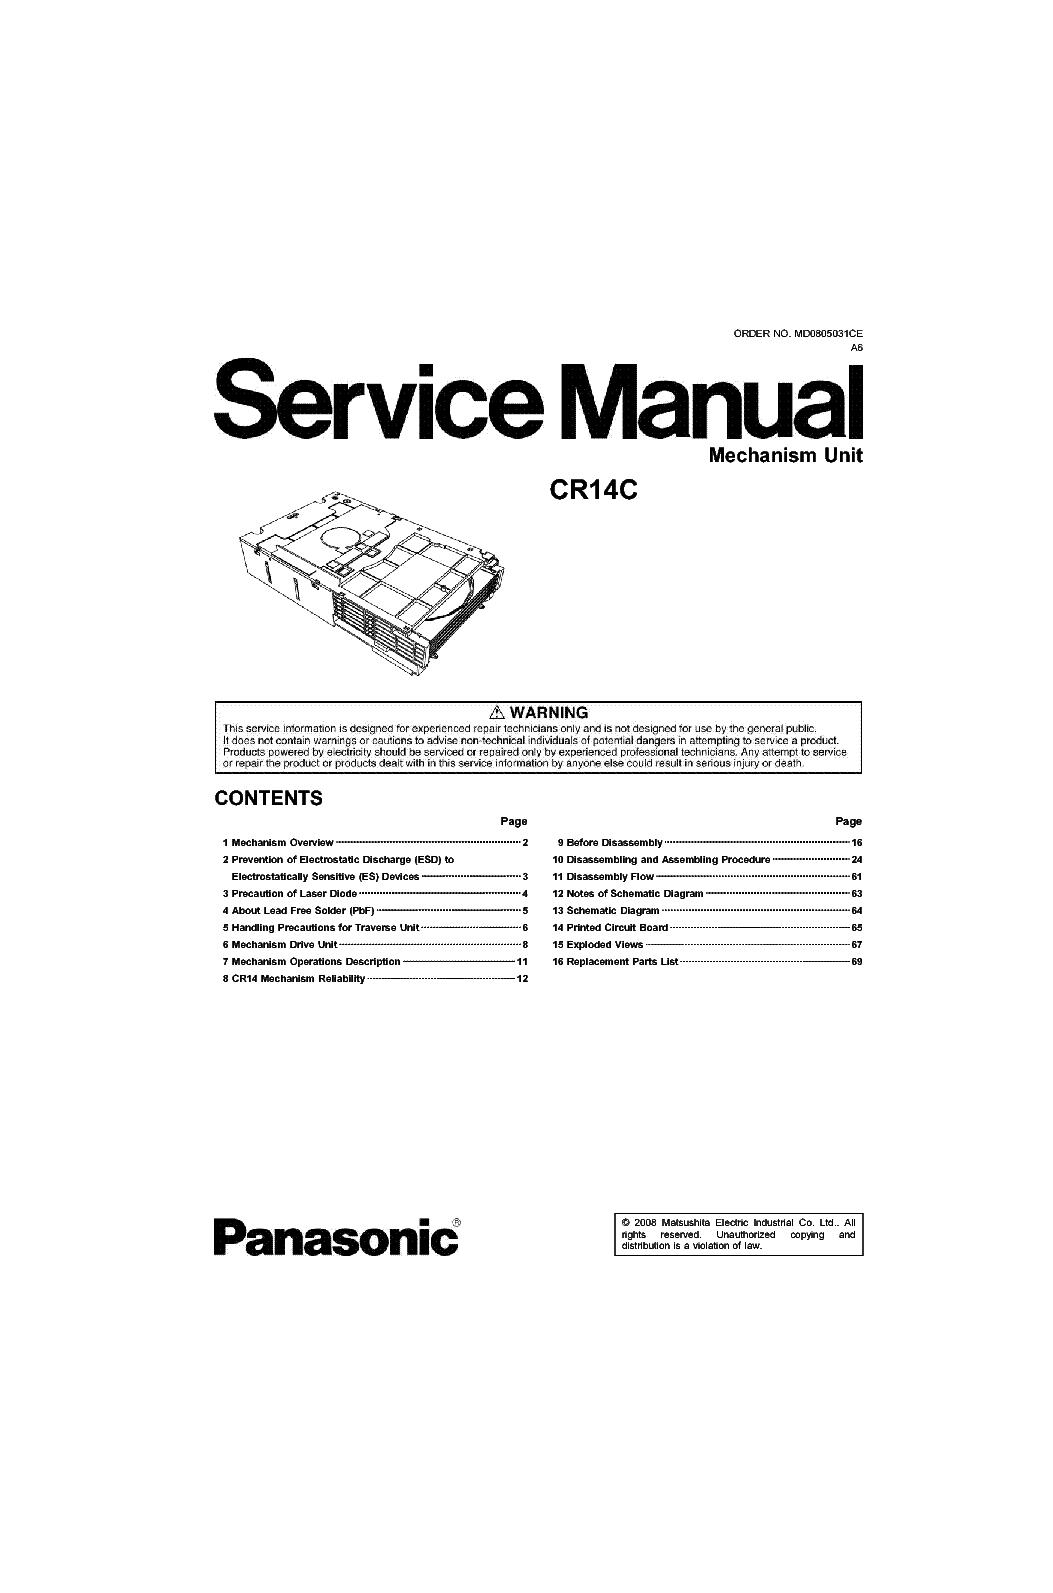 panasonic cr14c cd changer mechanism unit sm service manual download rh elektrotanya com panasonic 5 disc cd changer manual Panasonic CD Changer for Car